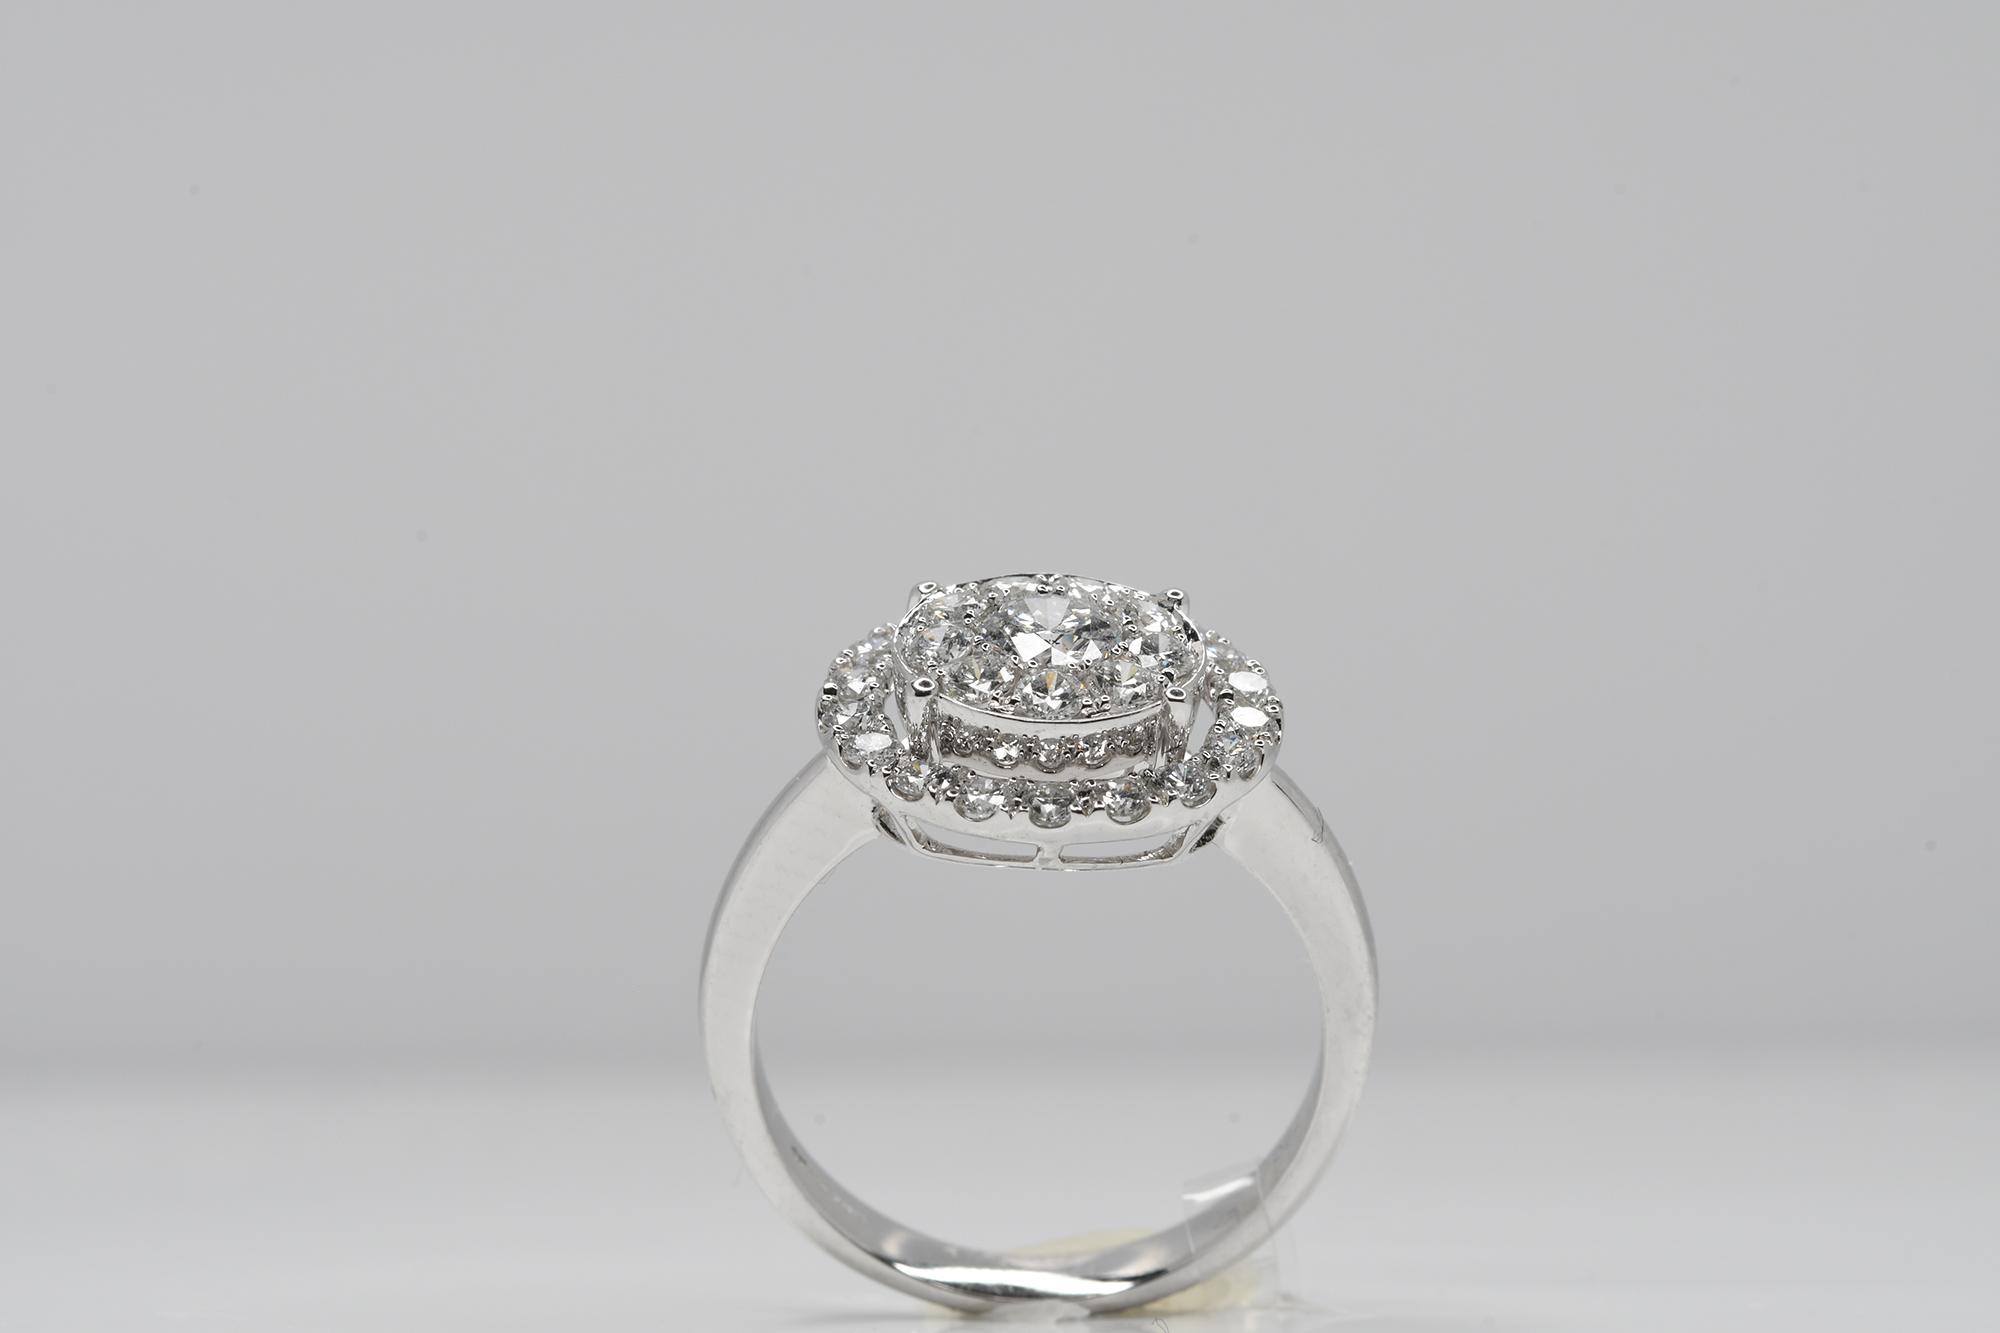 Diamond Ring - Image 5 of 5